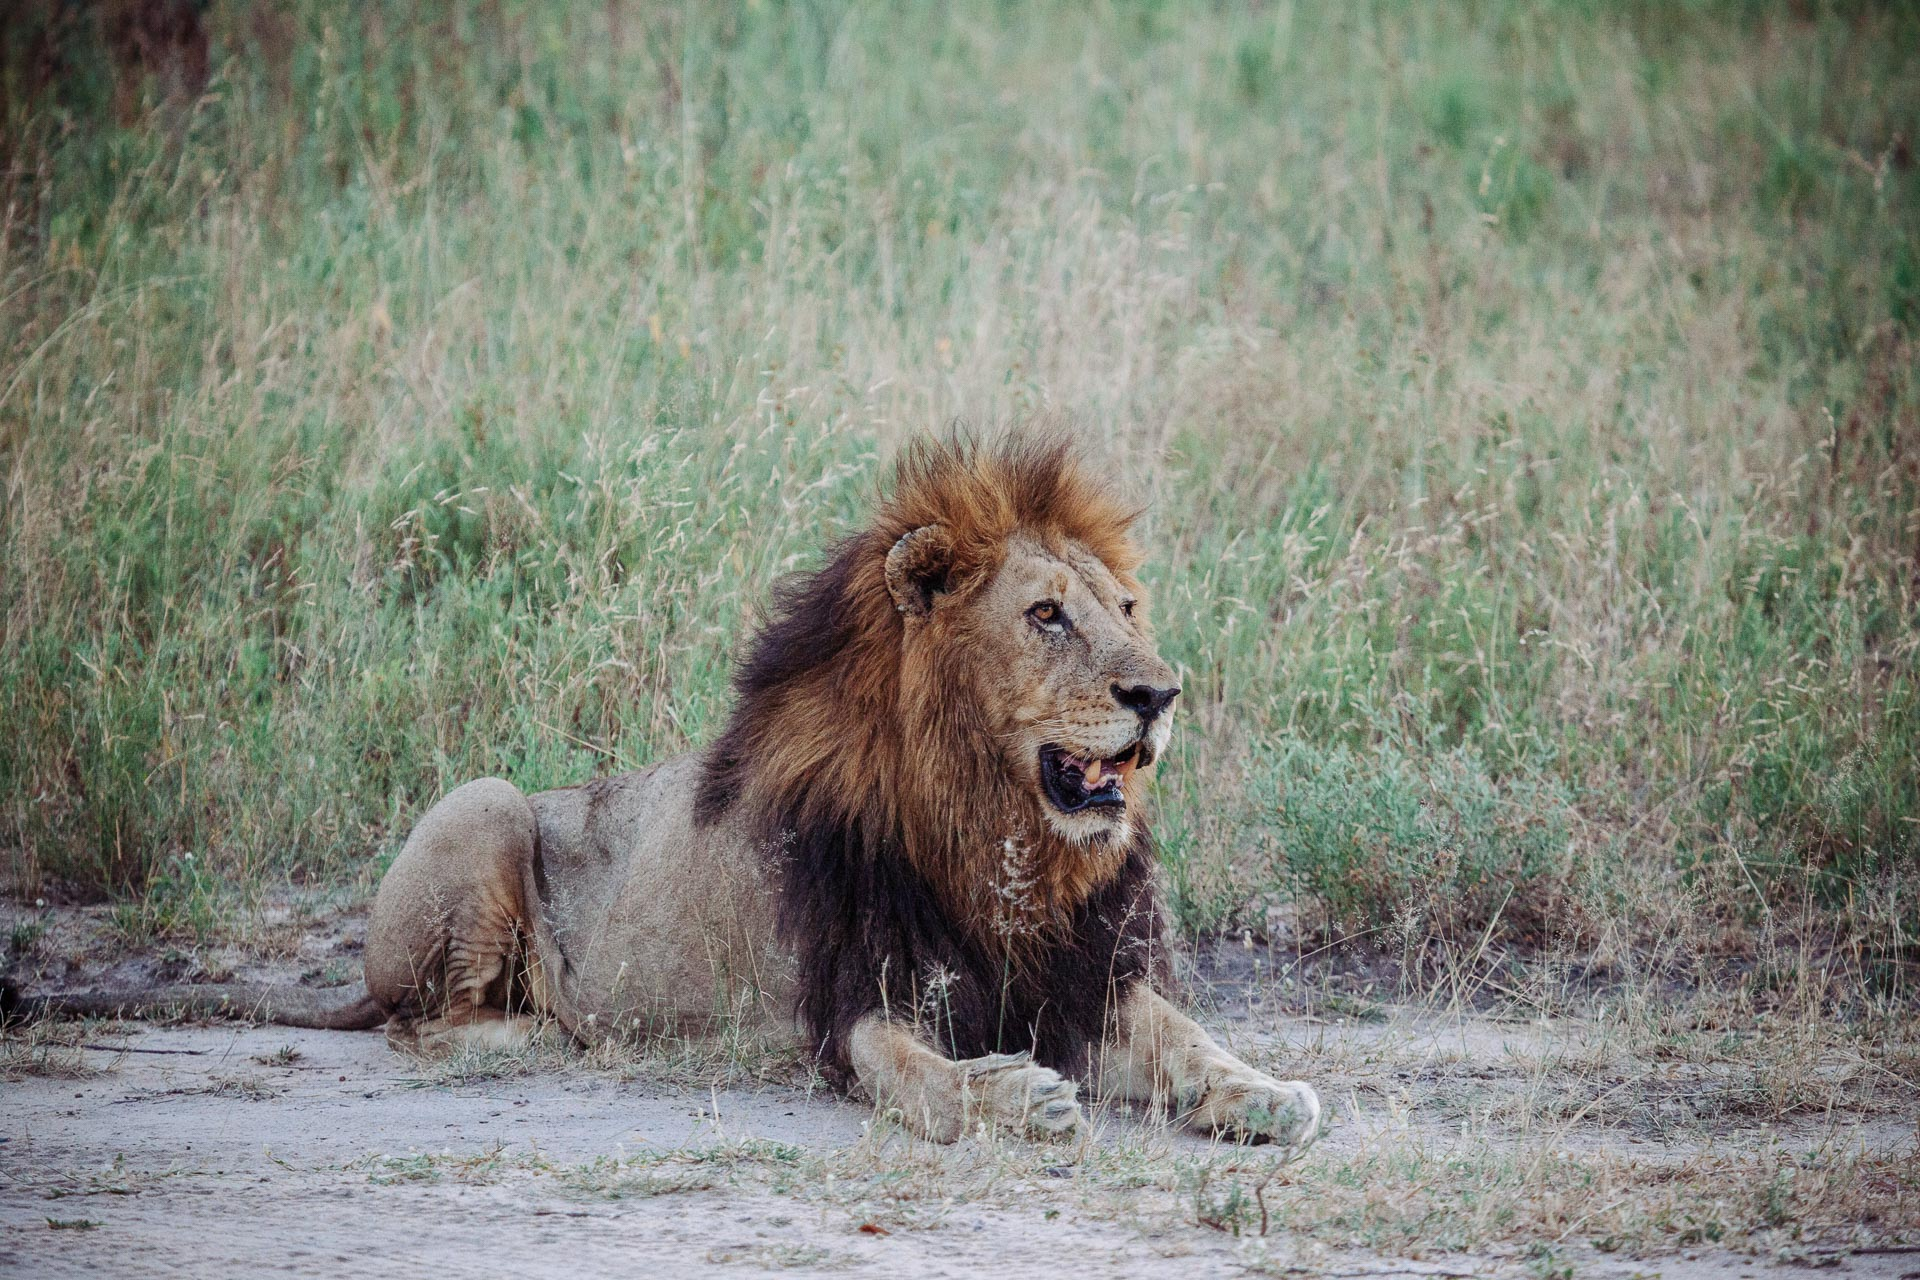 Sabi Sand, un safari plein de z'animaux